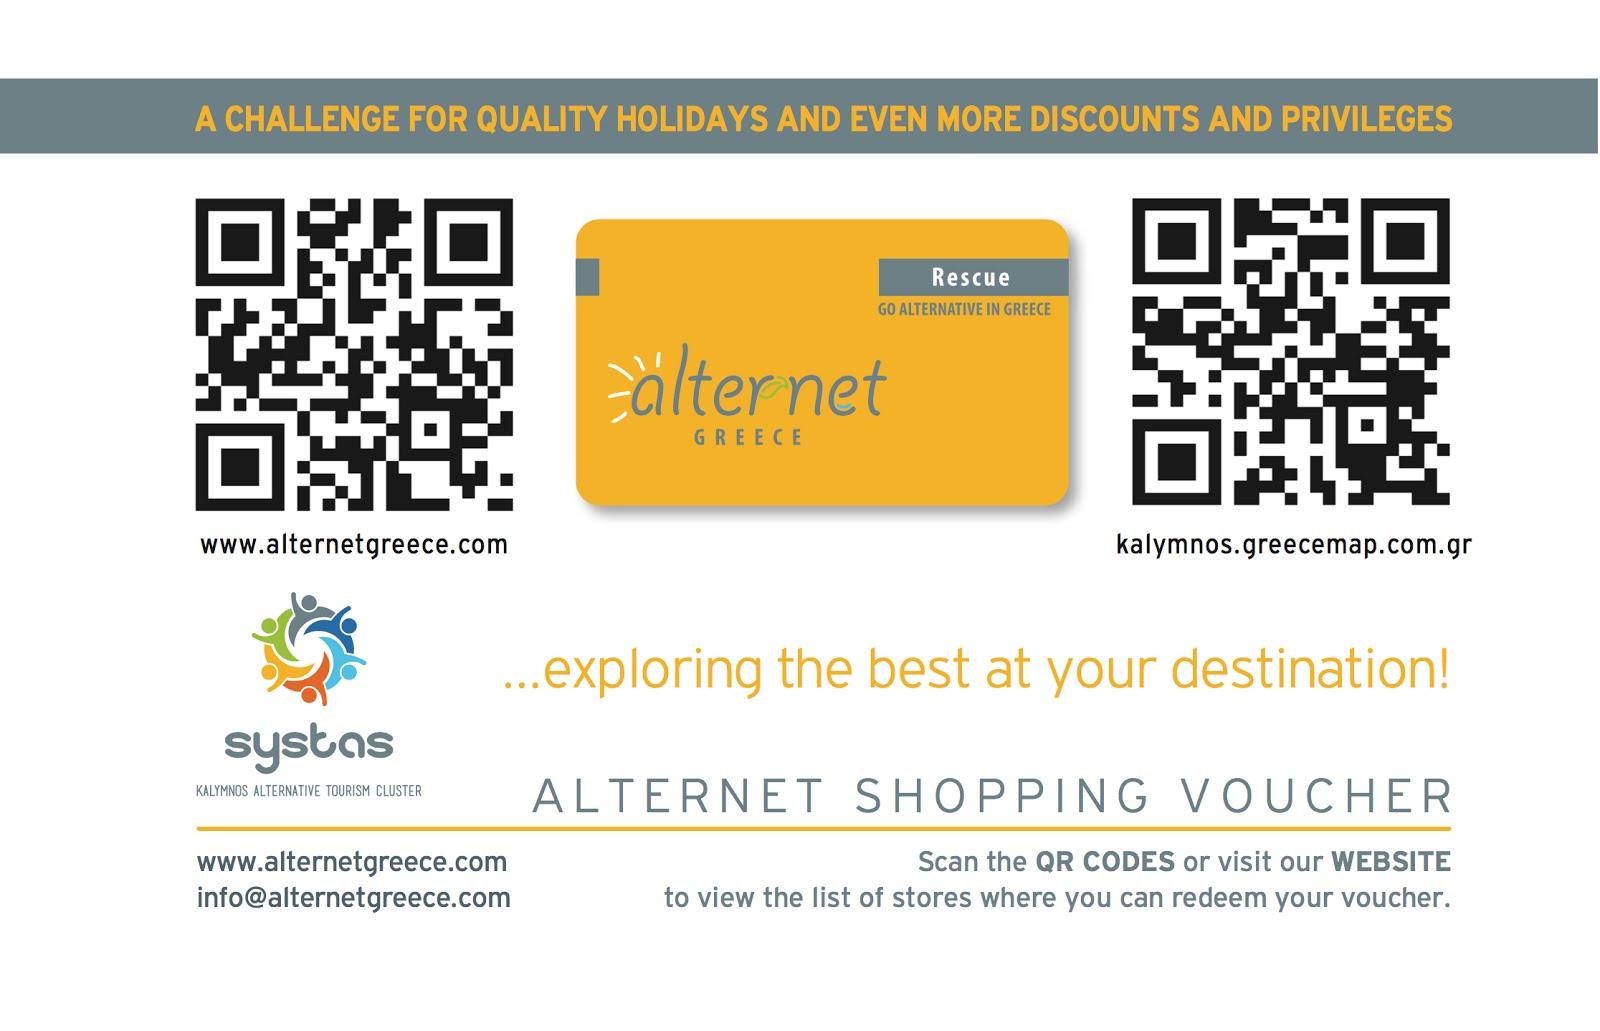 Alternet Shopping Voucher